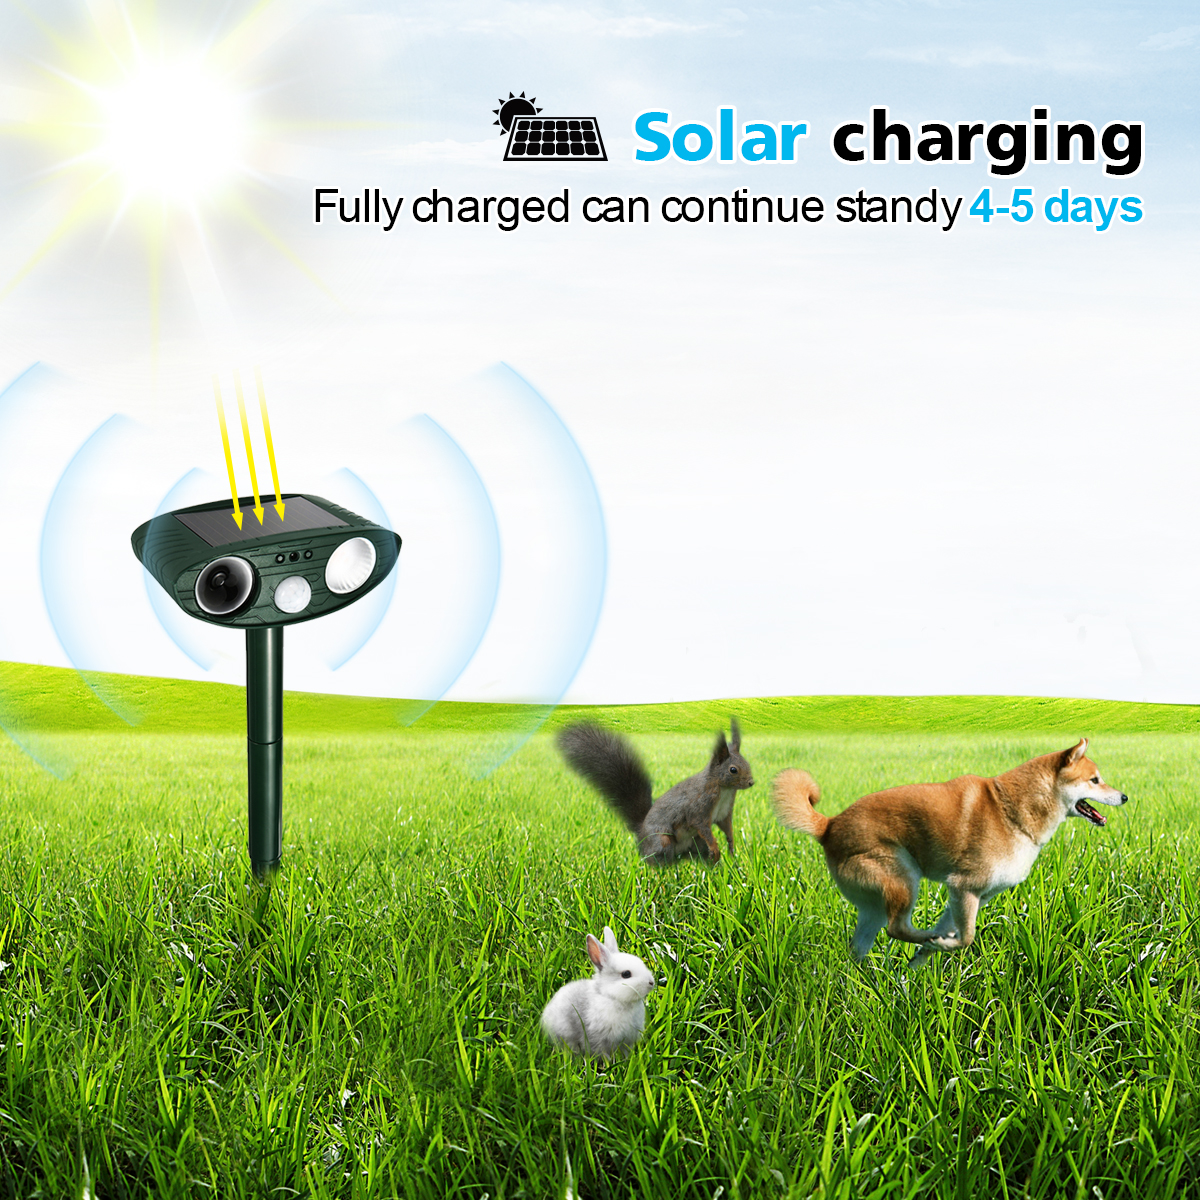 2Pcs Garden Outdoor Solar Powered Animal Repeller Motion Sensor Ultrasonic LED Flash Light Dog Cat Skunk Repellent